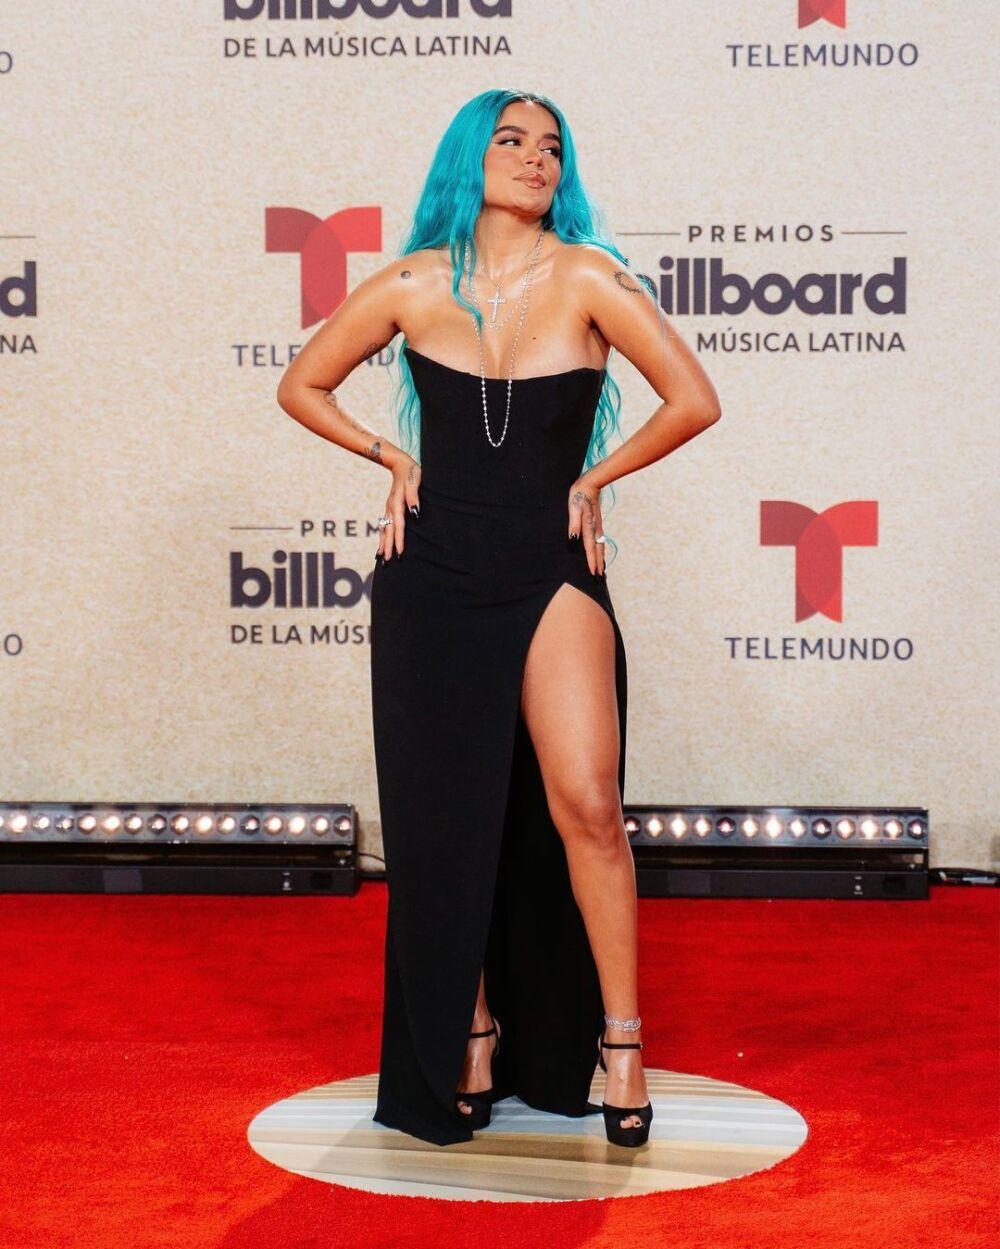 Billboard - Karol G.jpg